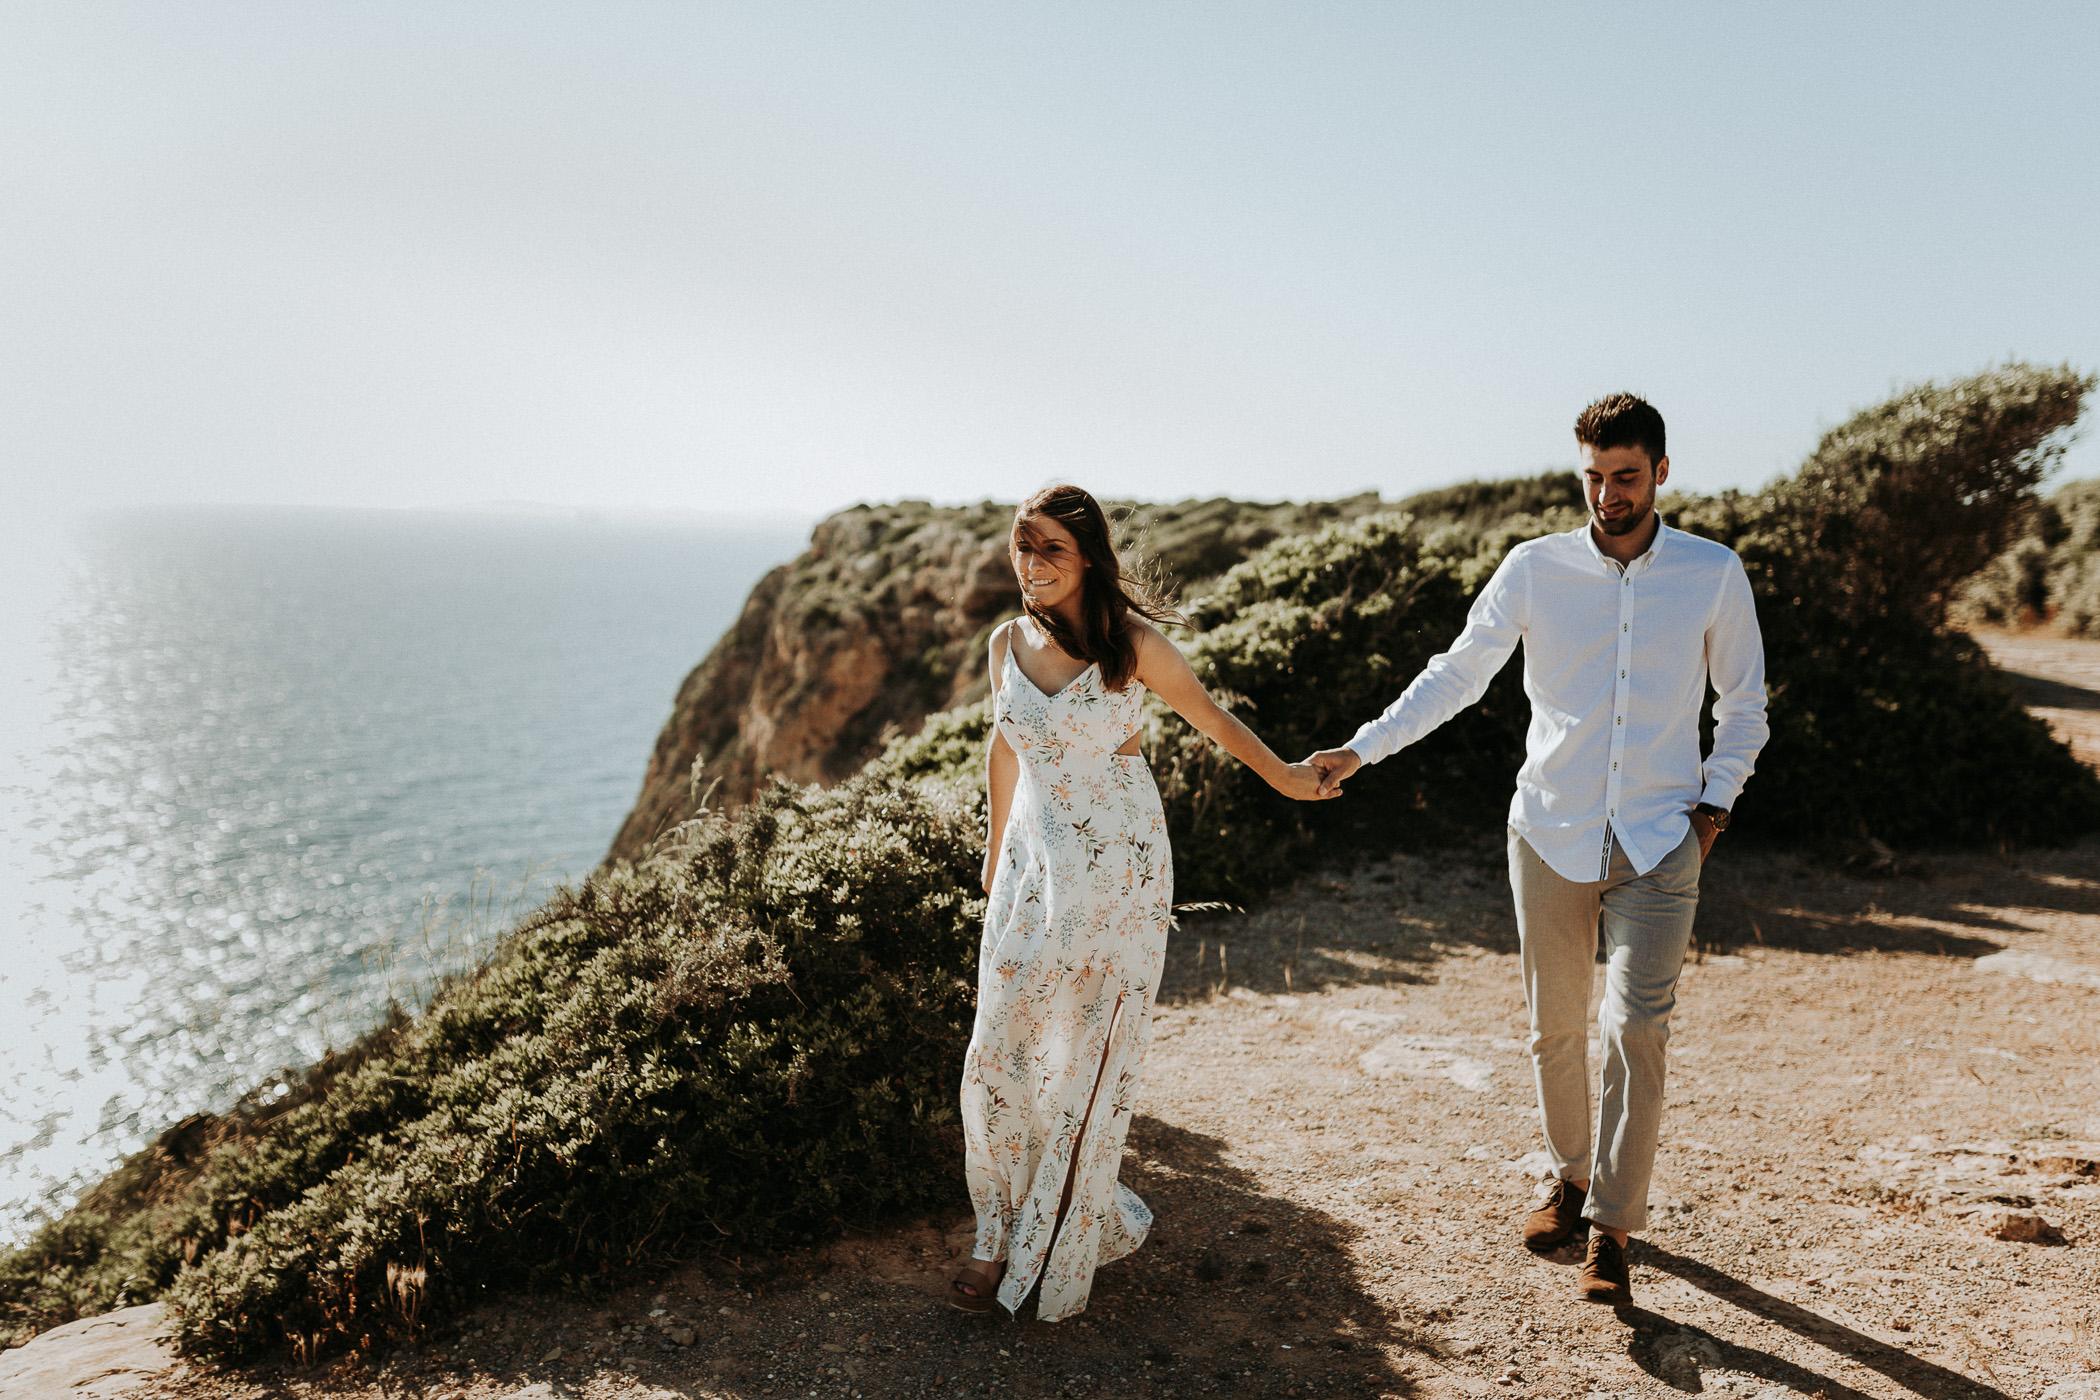 DanielaMarquardtPhotography_wedding_elopement_mallorca_spain_calapi_palma_lauraandtoni_66